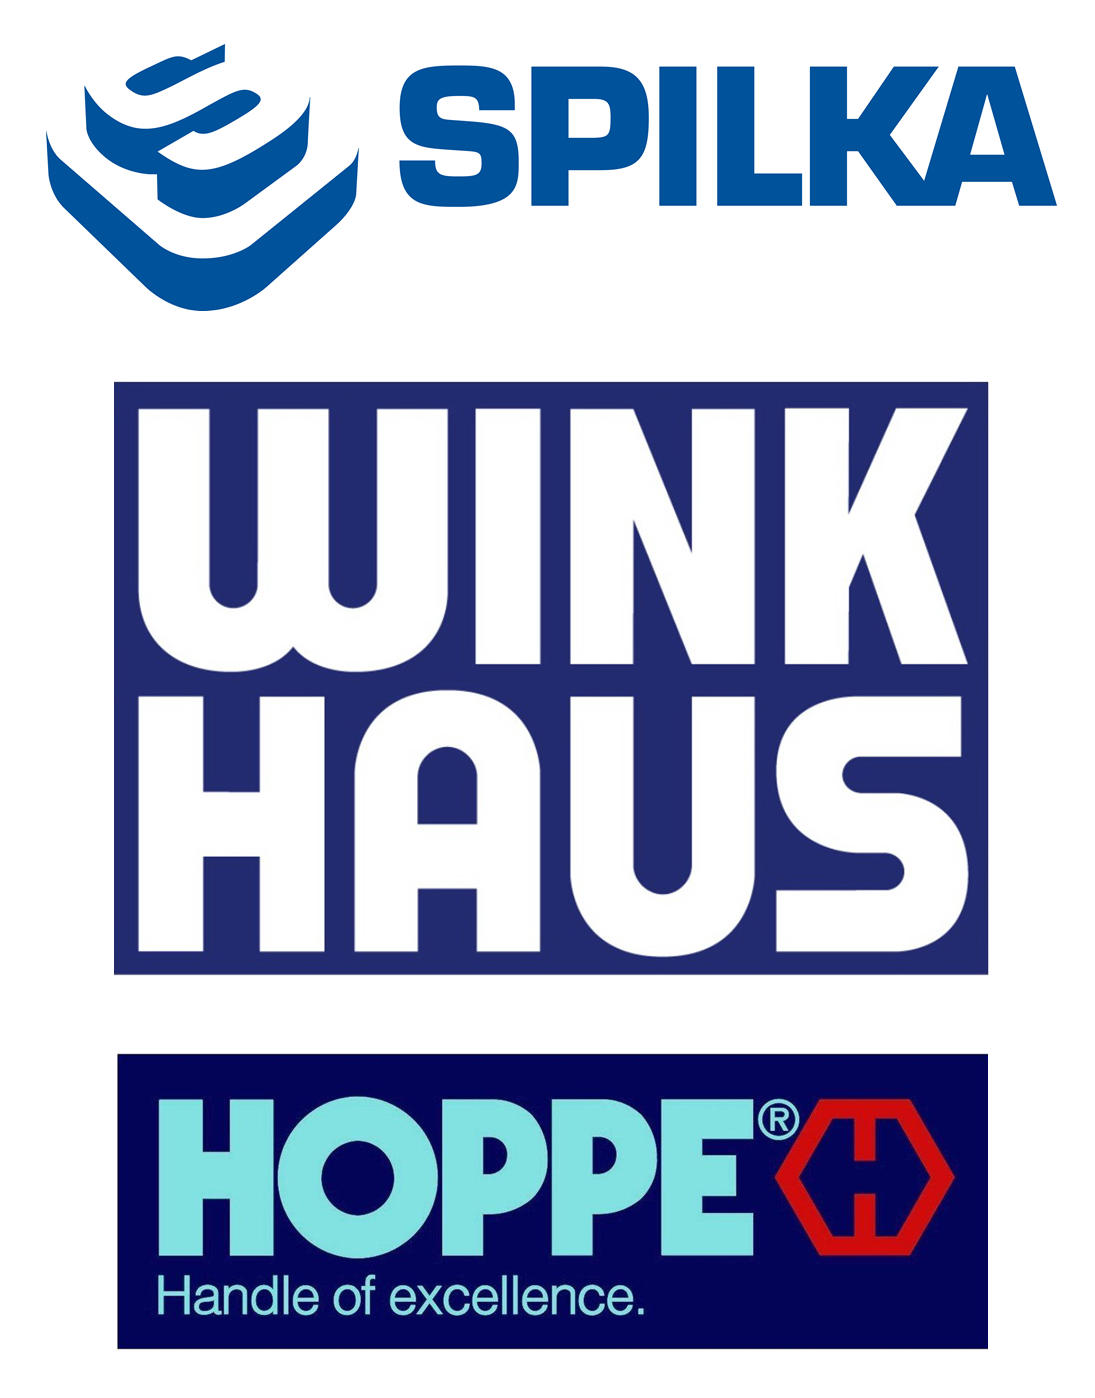 Spilka, Winkhaus & Hoppe